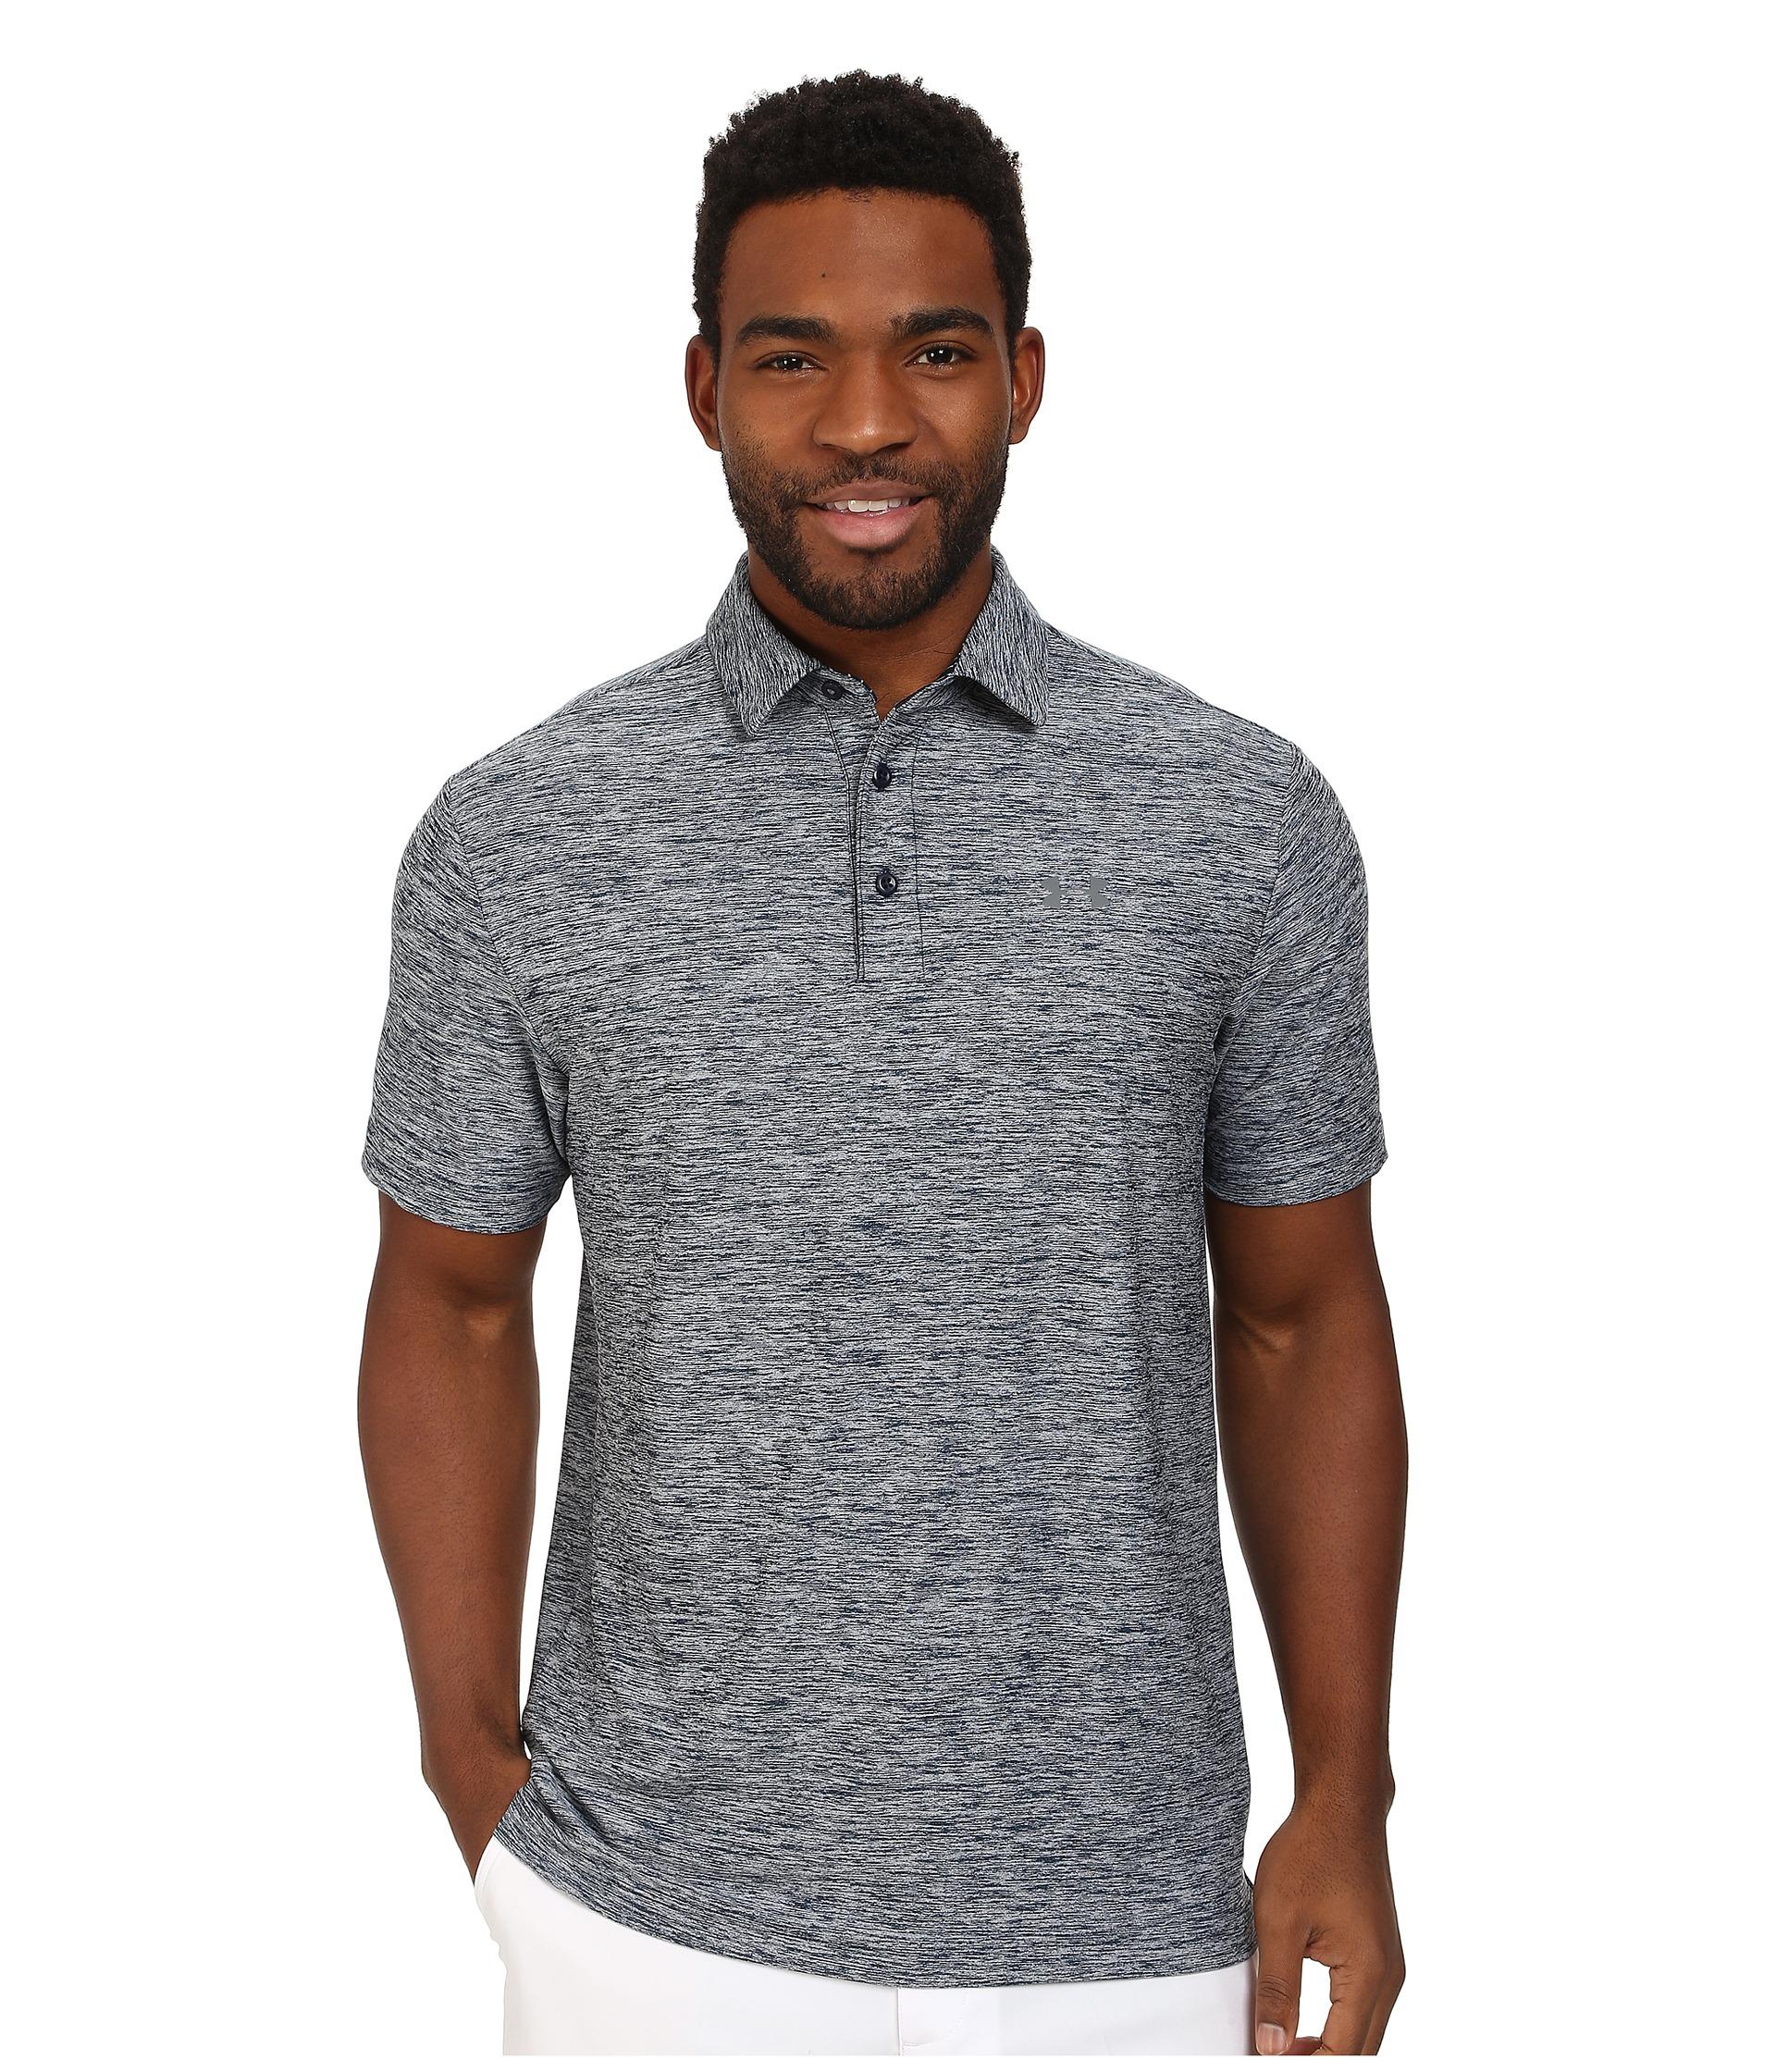 Under armour golf heather playoff polo shirt in gray for for Gray under armour shirt